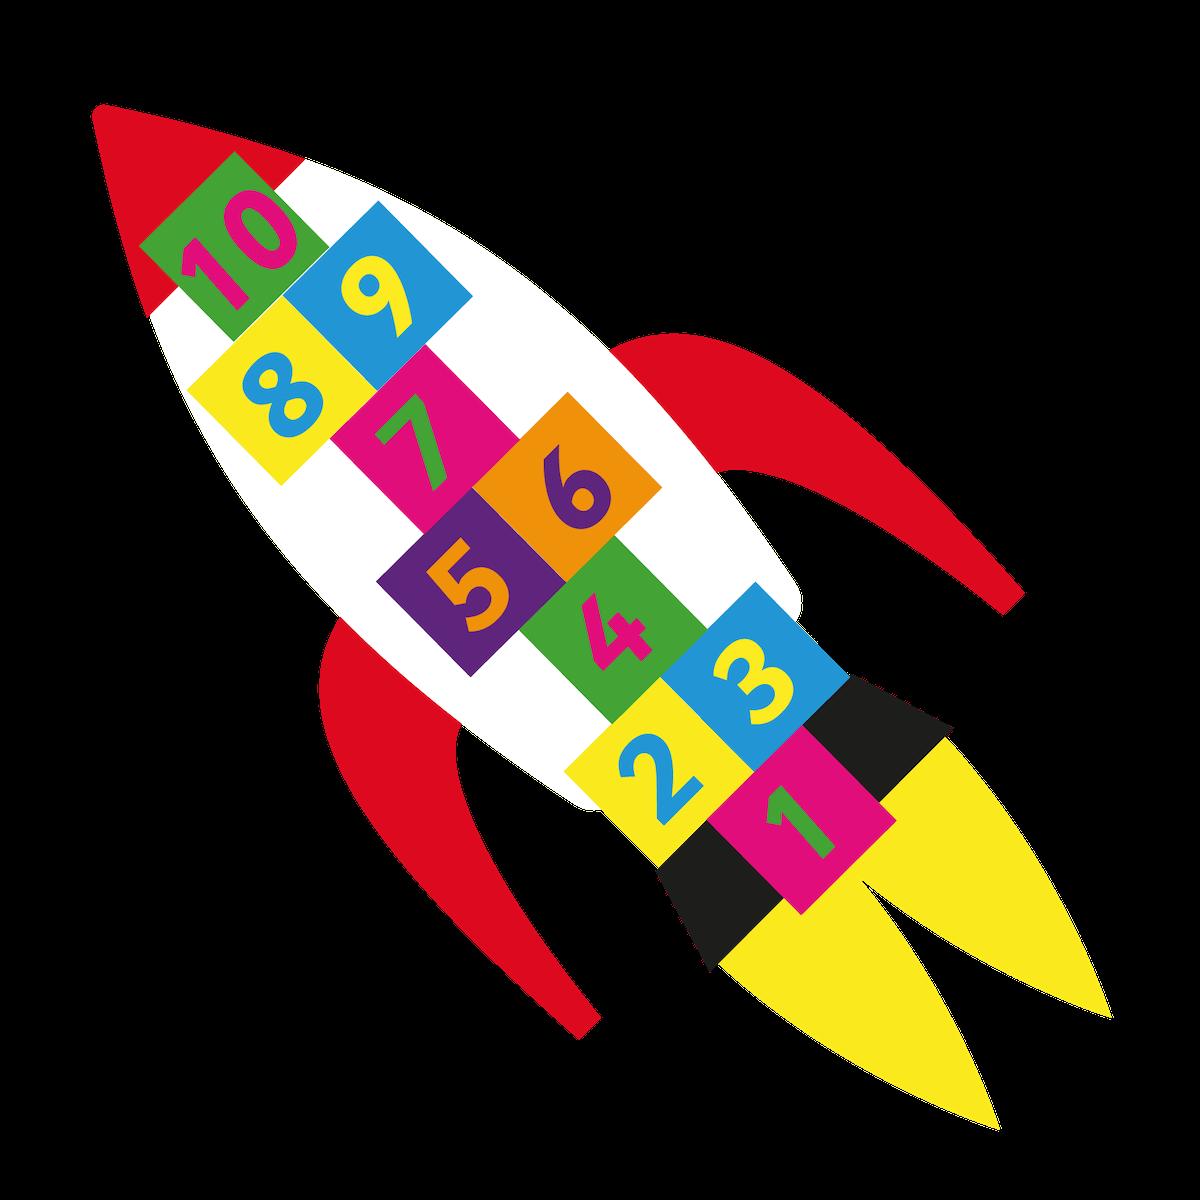 Playground Marking Rocket Hopscotch